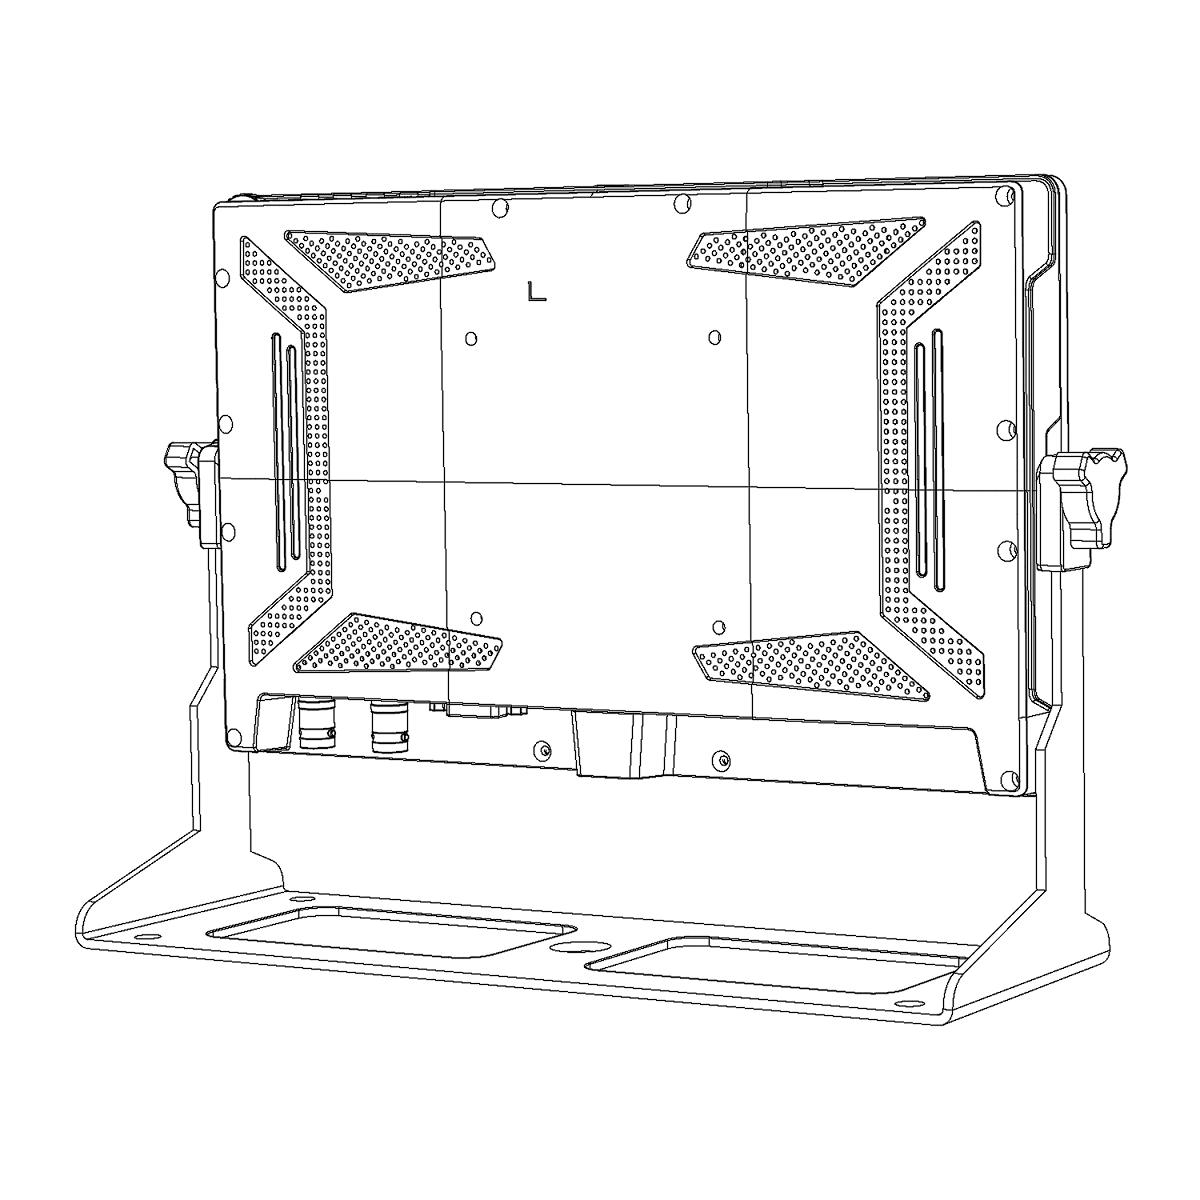 LILLIPUT 10.1'' FHD HDMI/SDI Monitor 6